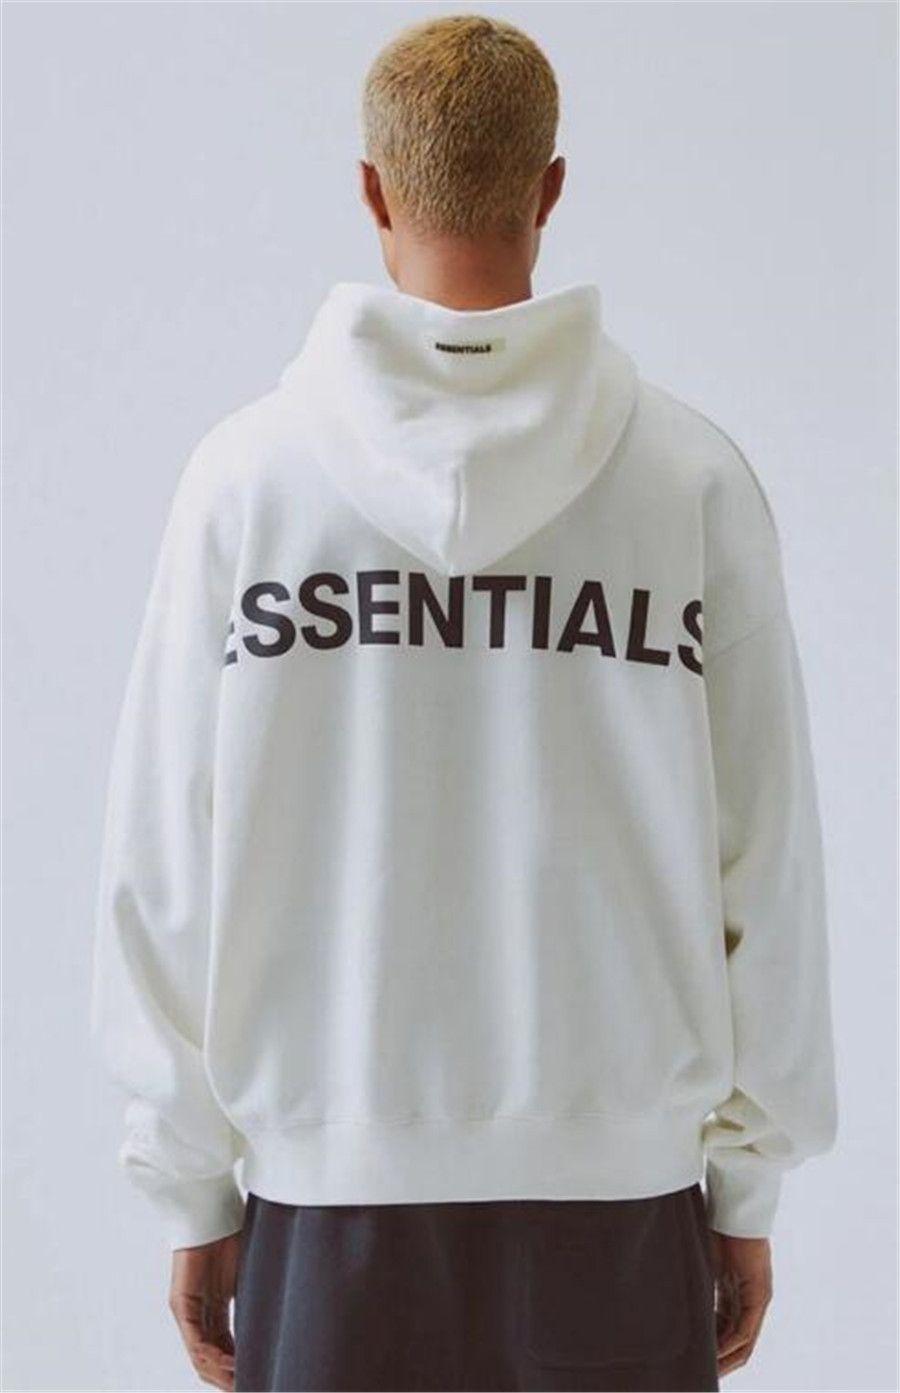 Arxum miedo a Dios jersey fg manga larga década de 19ss calle 6t sudadera suéter de niebla jerry simple moda oodies sólido camiseta FYM # 678 'FG't SXPK